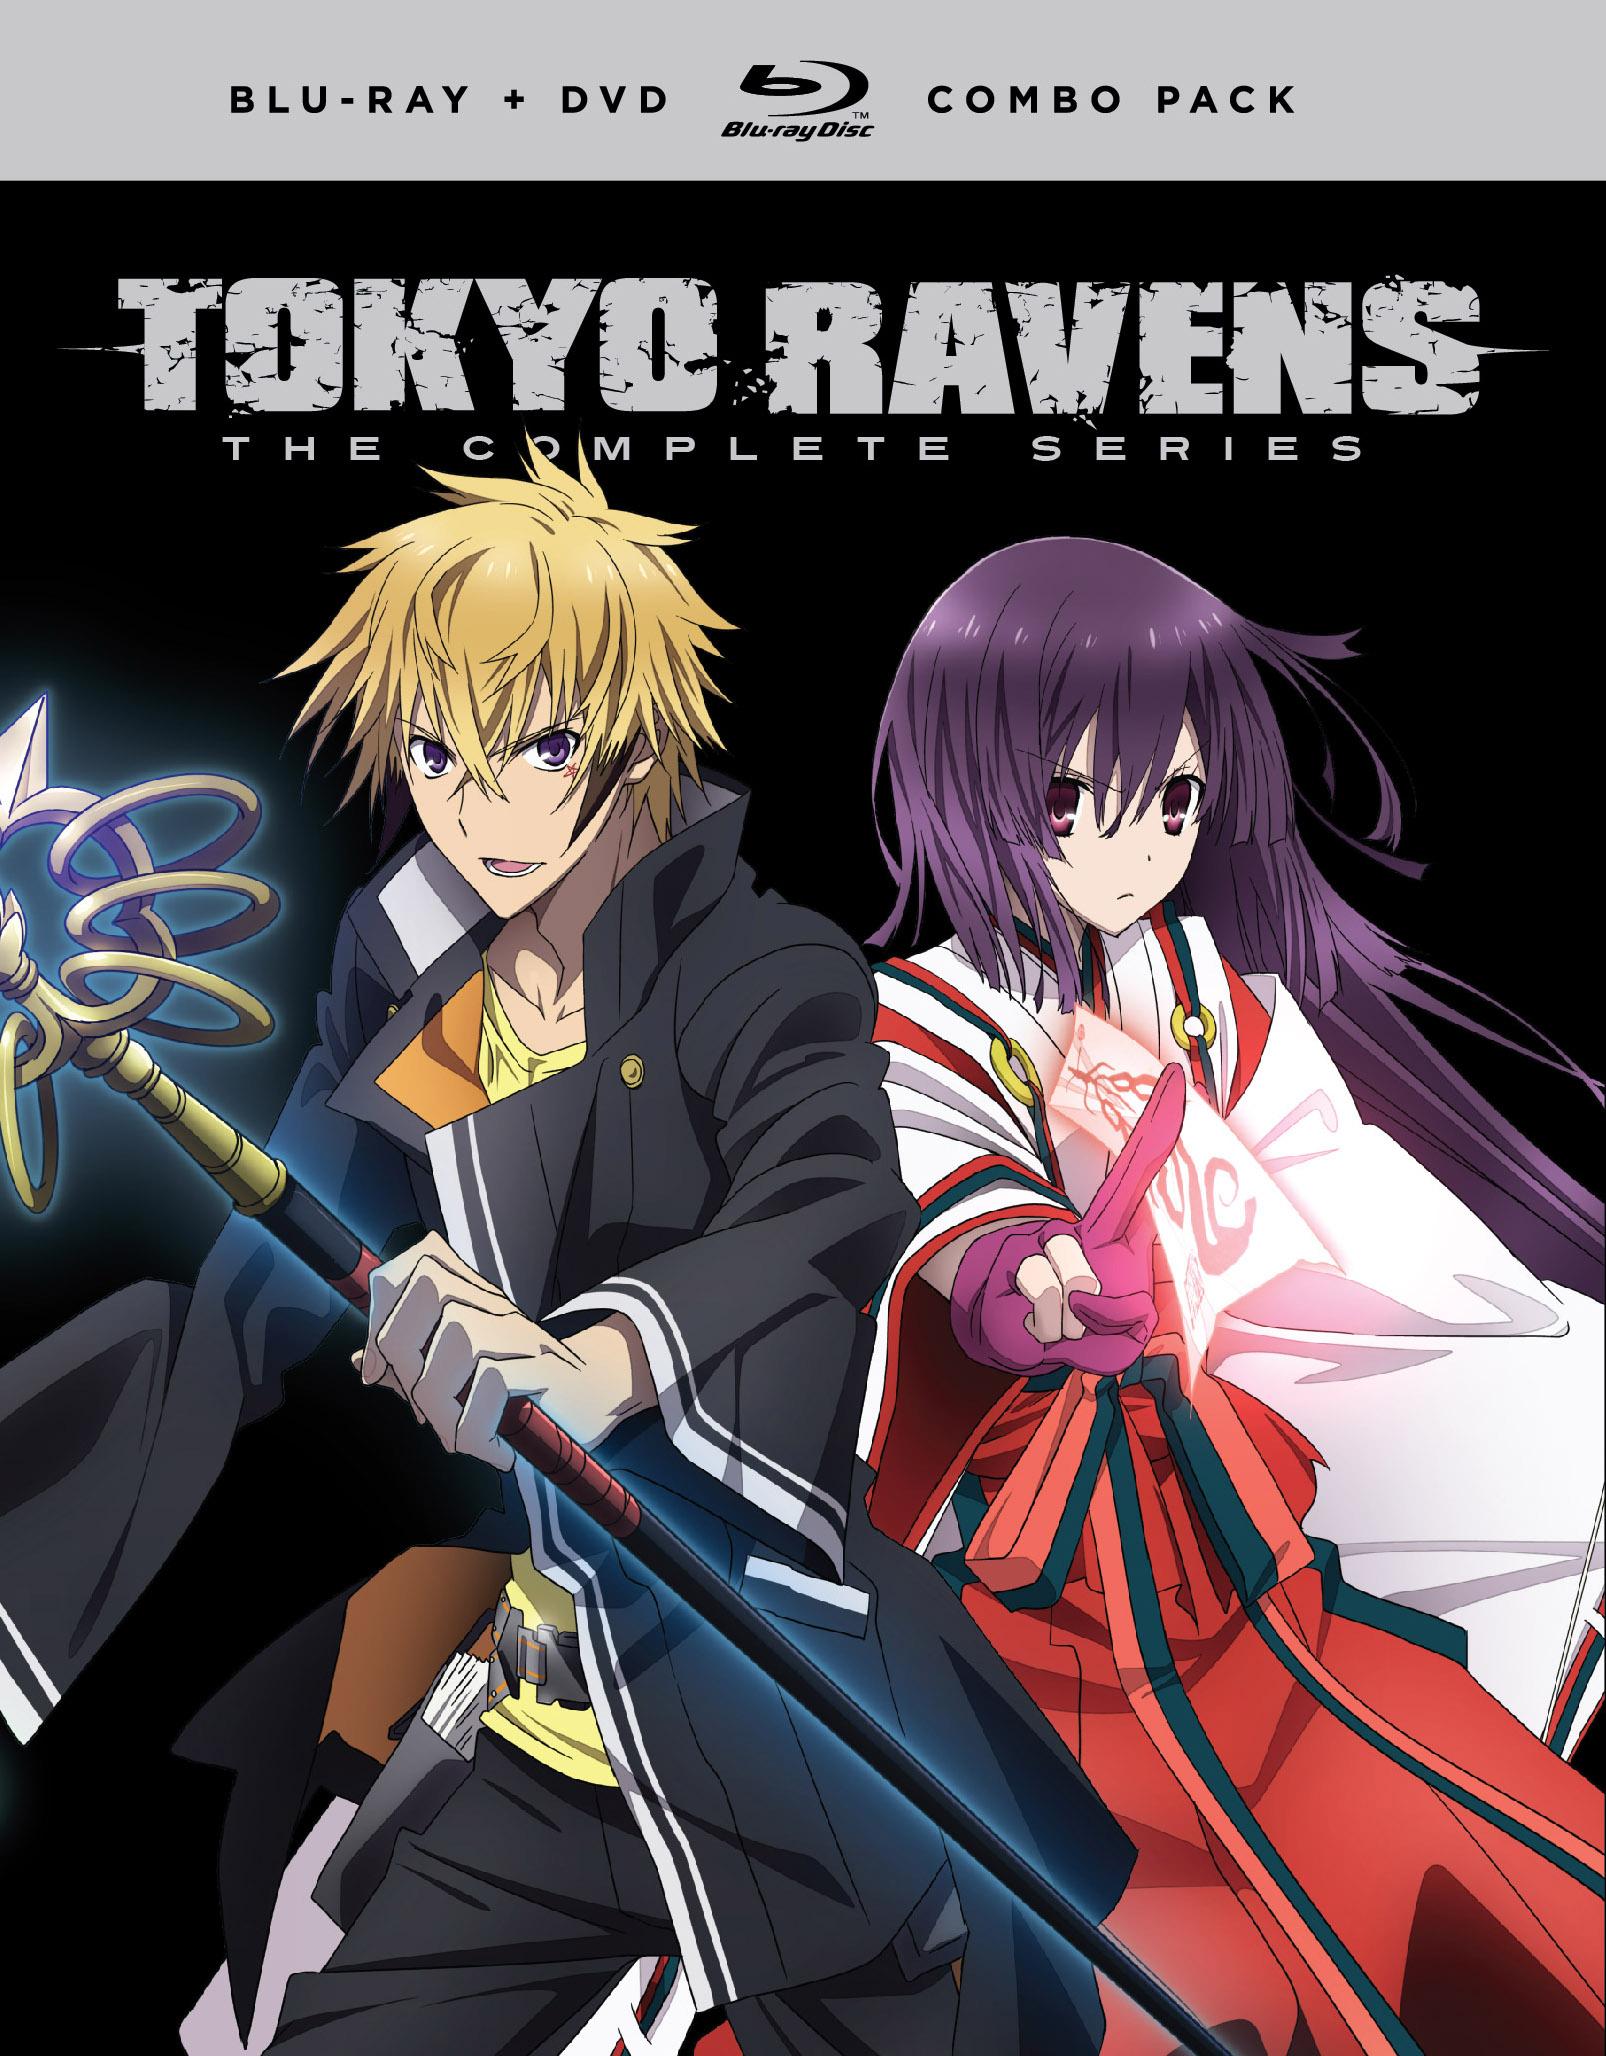 Tokyo Ravens Complete Series Blu-ray/DVD 704400092930